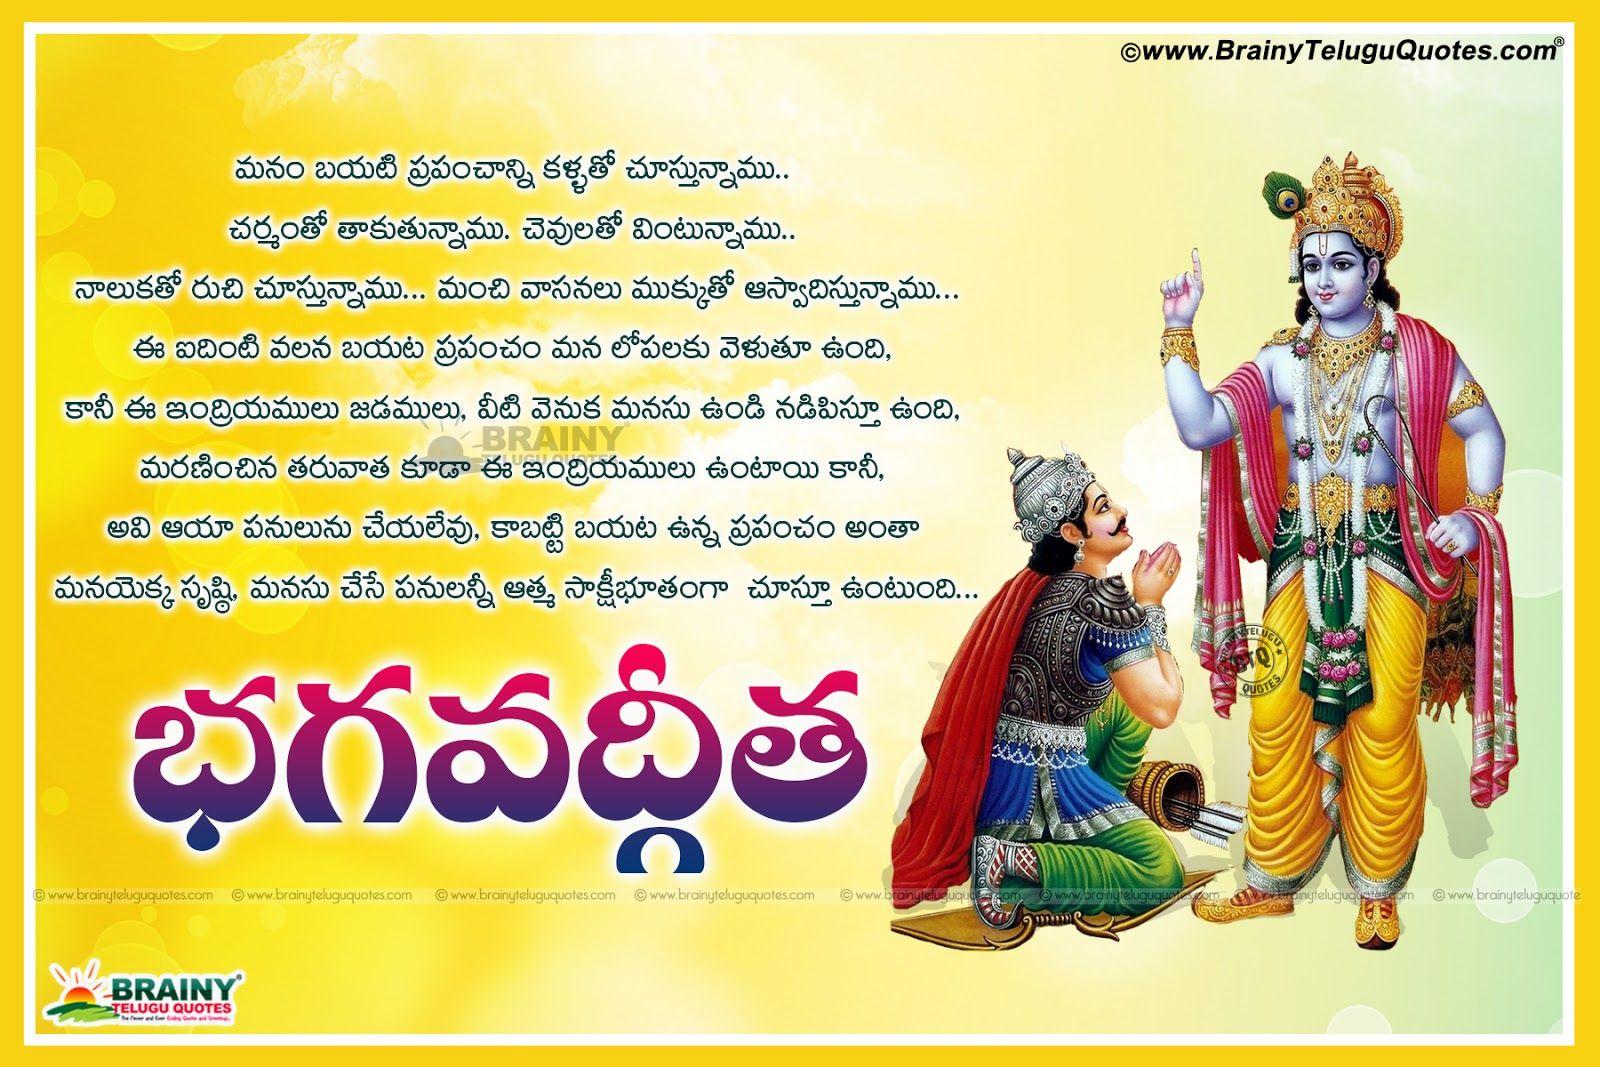 Bhagavad Gita Inspirational Life Success Quotations In Telugu